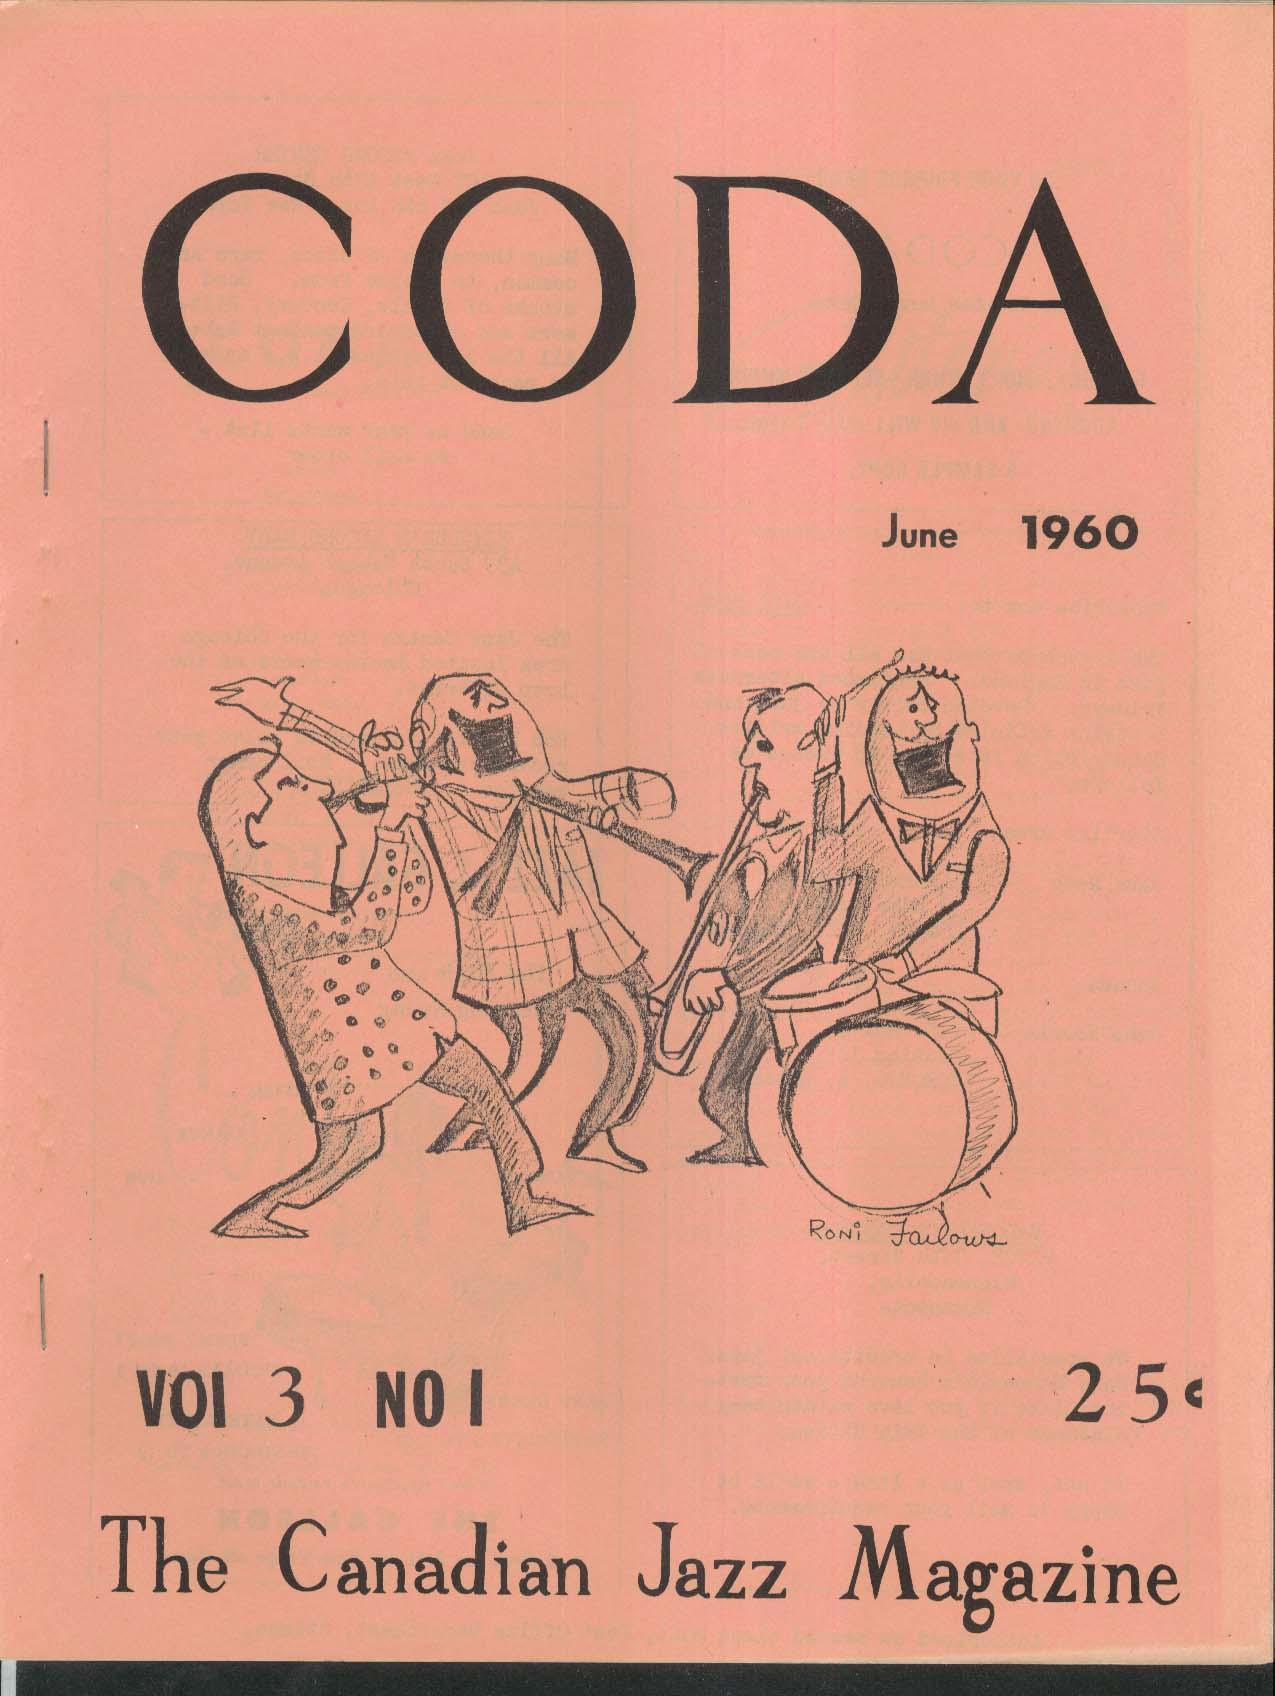 CODA V3 #1 Canadian Jazz Magazine Kewpie Doll Kant Argue 6 1960